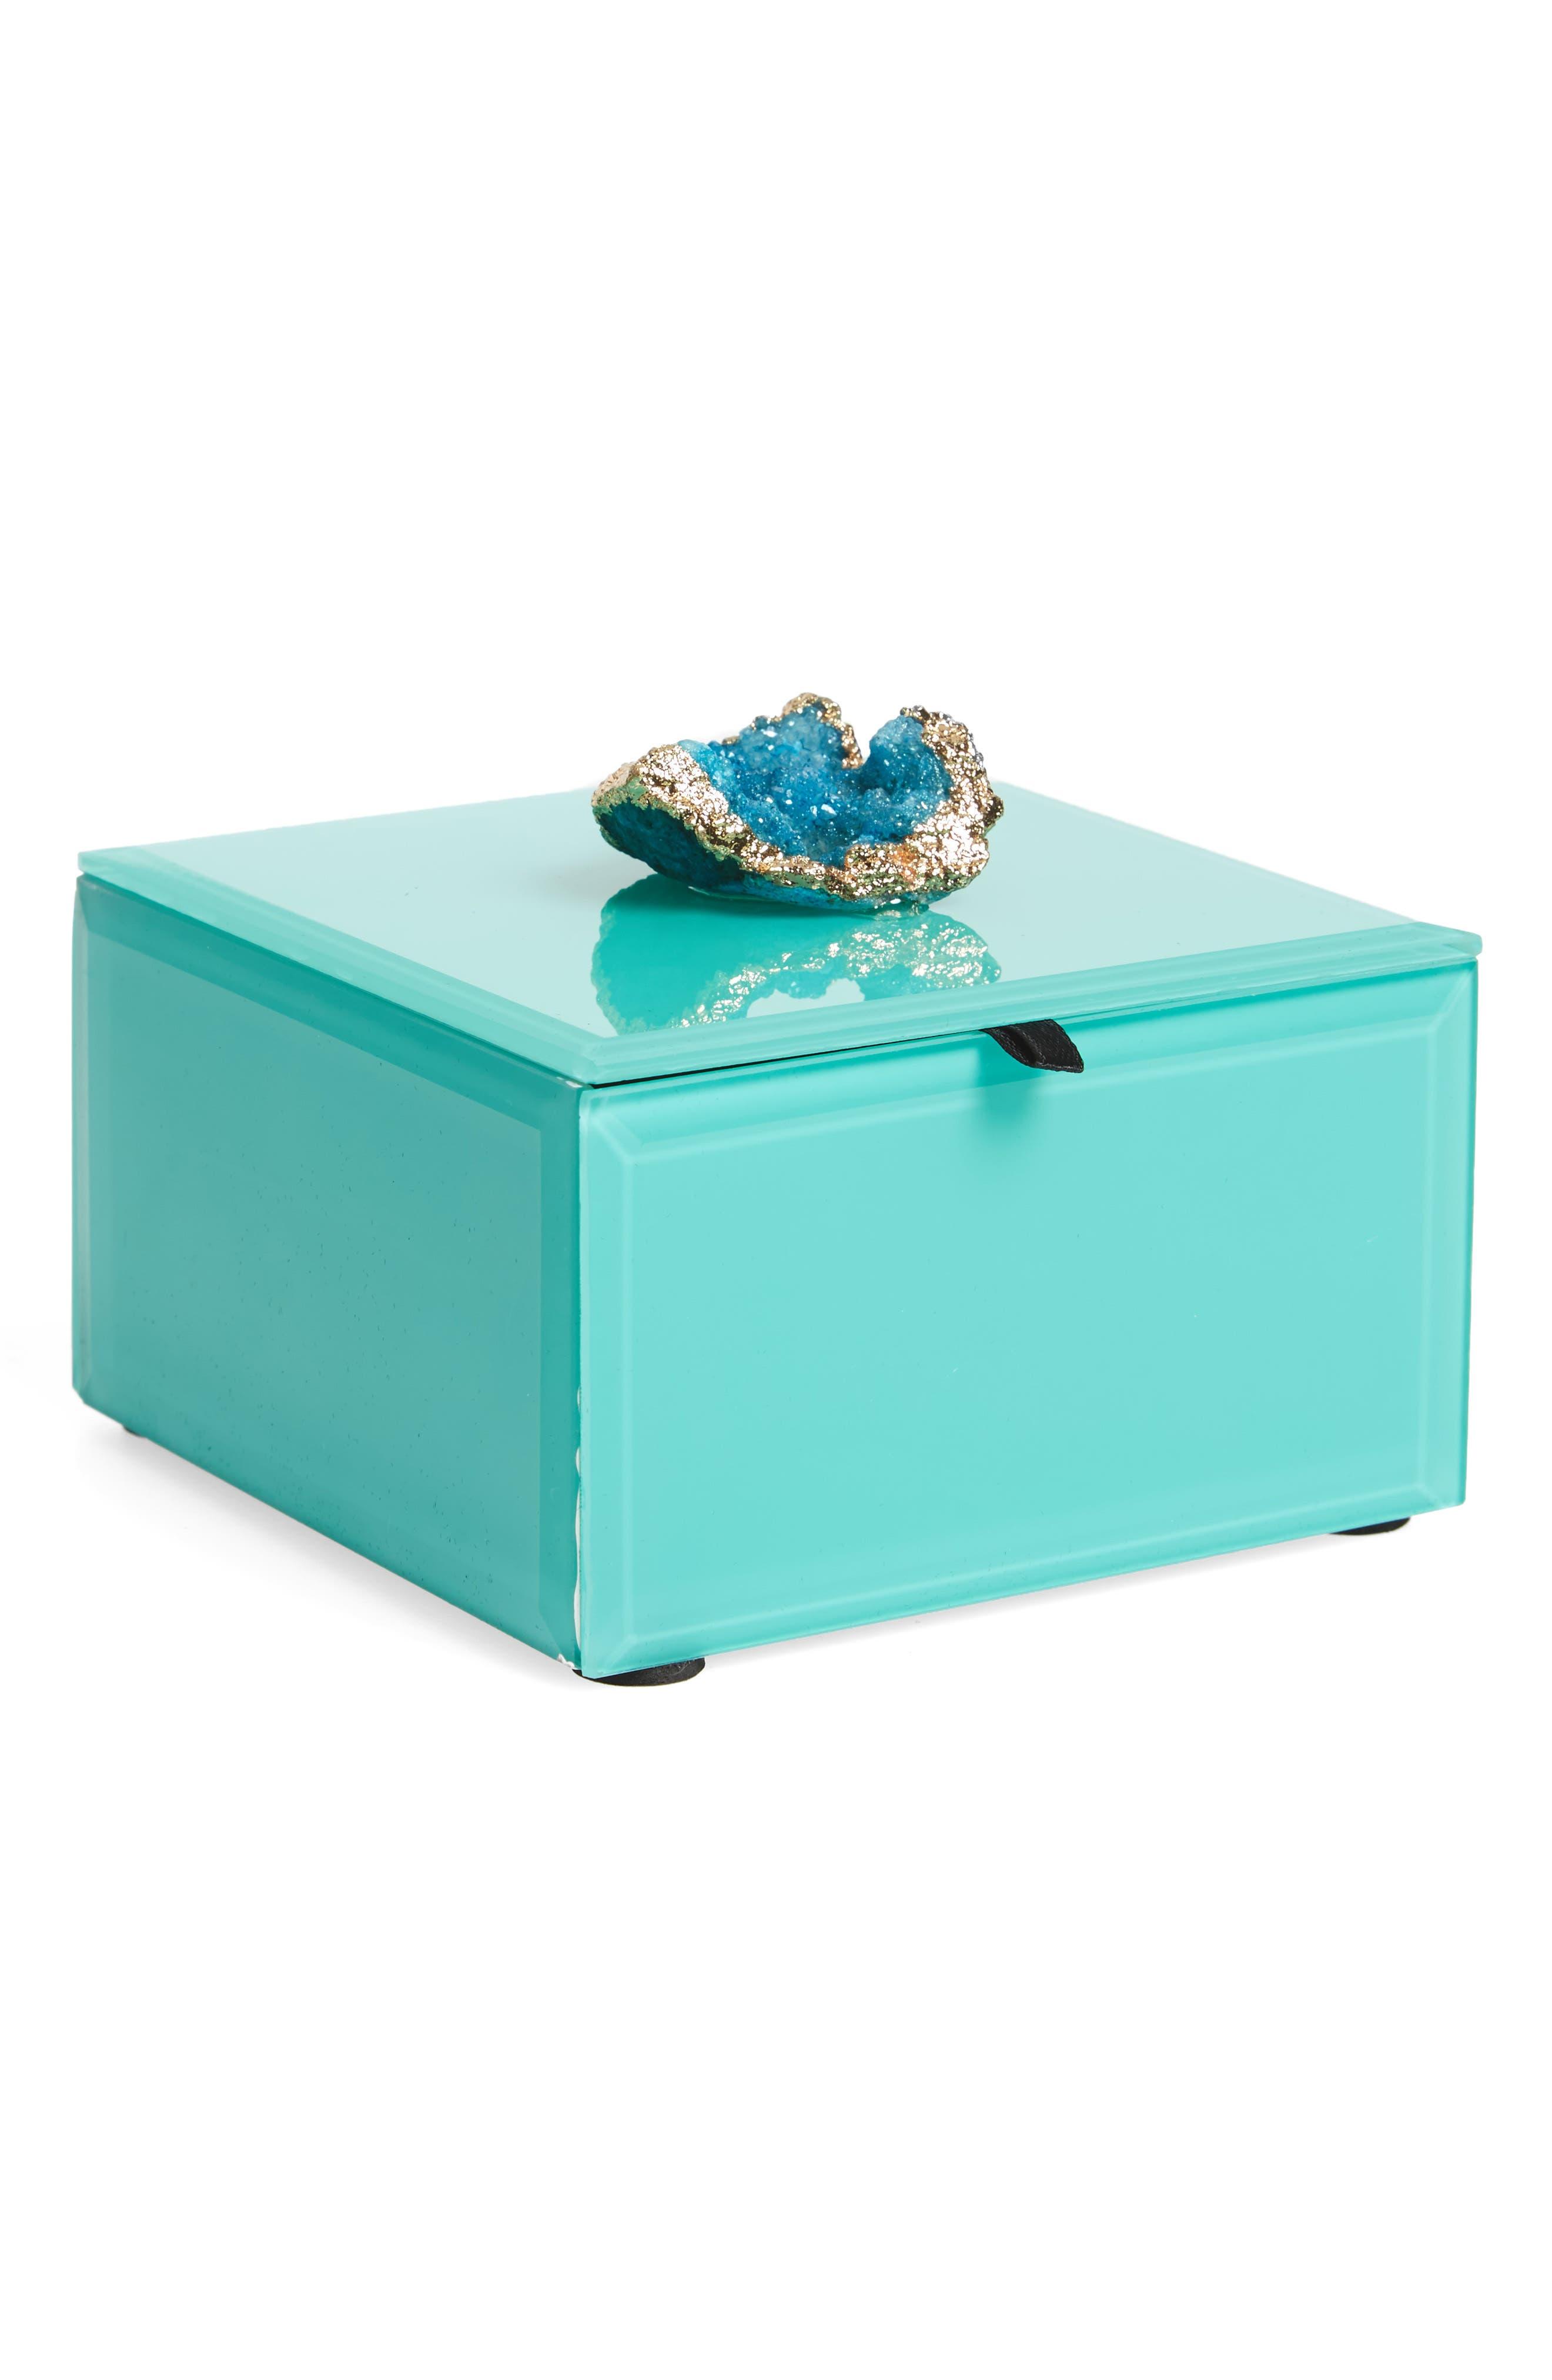 Peacock Agate Jewelry Box,                             Main thumbnail 1, color,